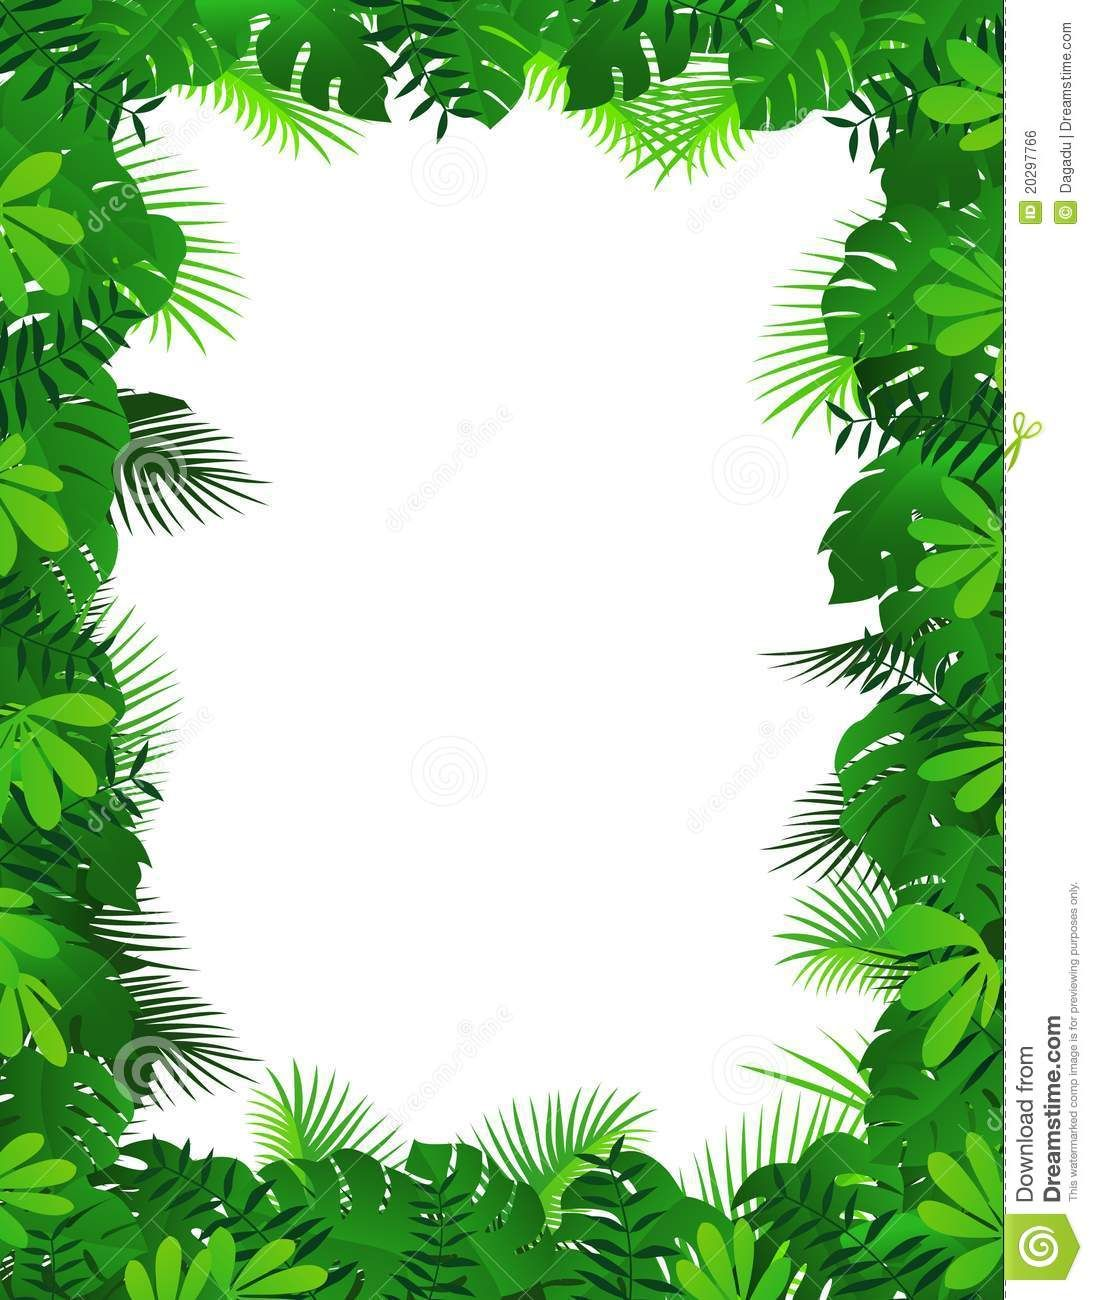 Nature Forest Frame